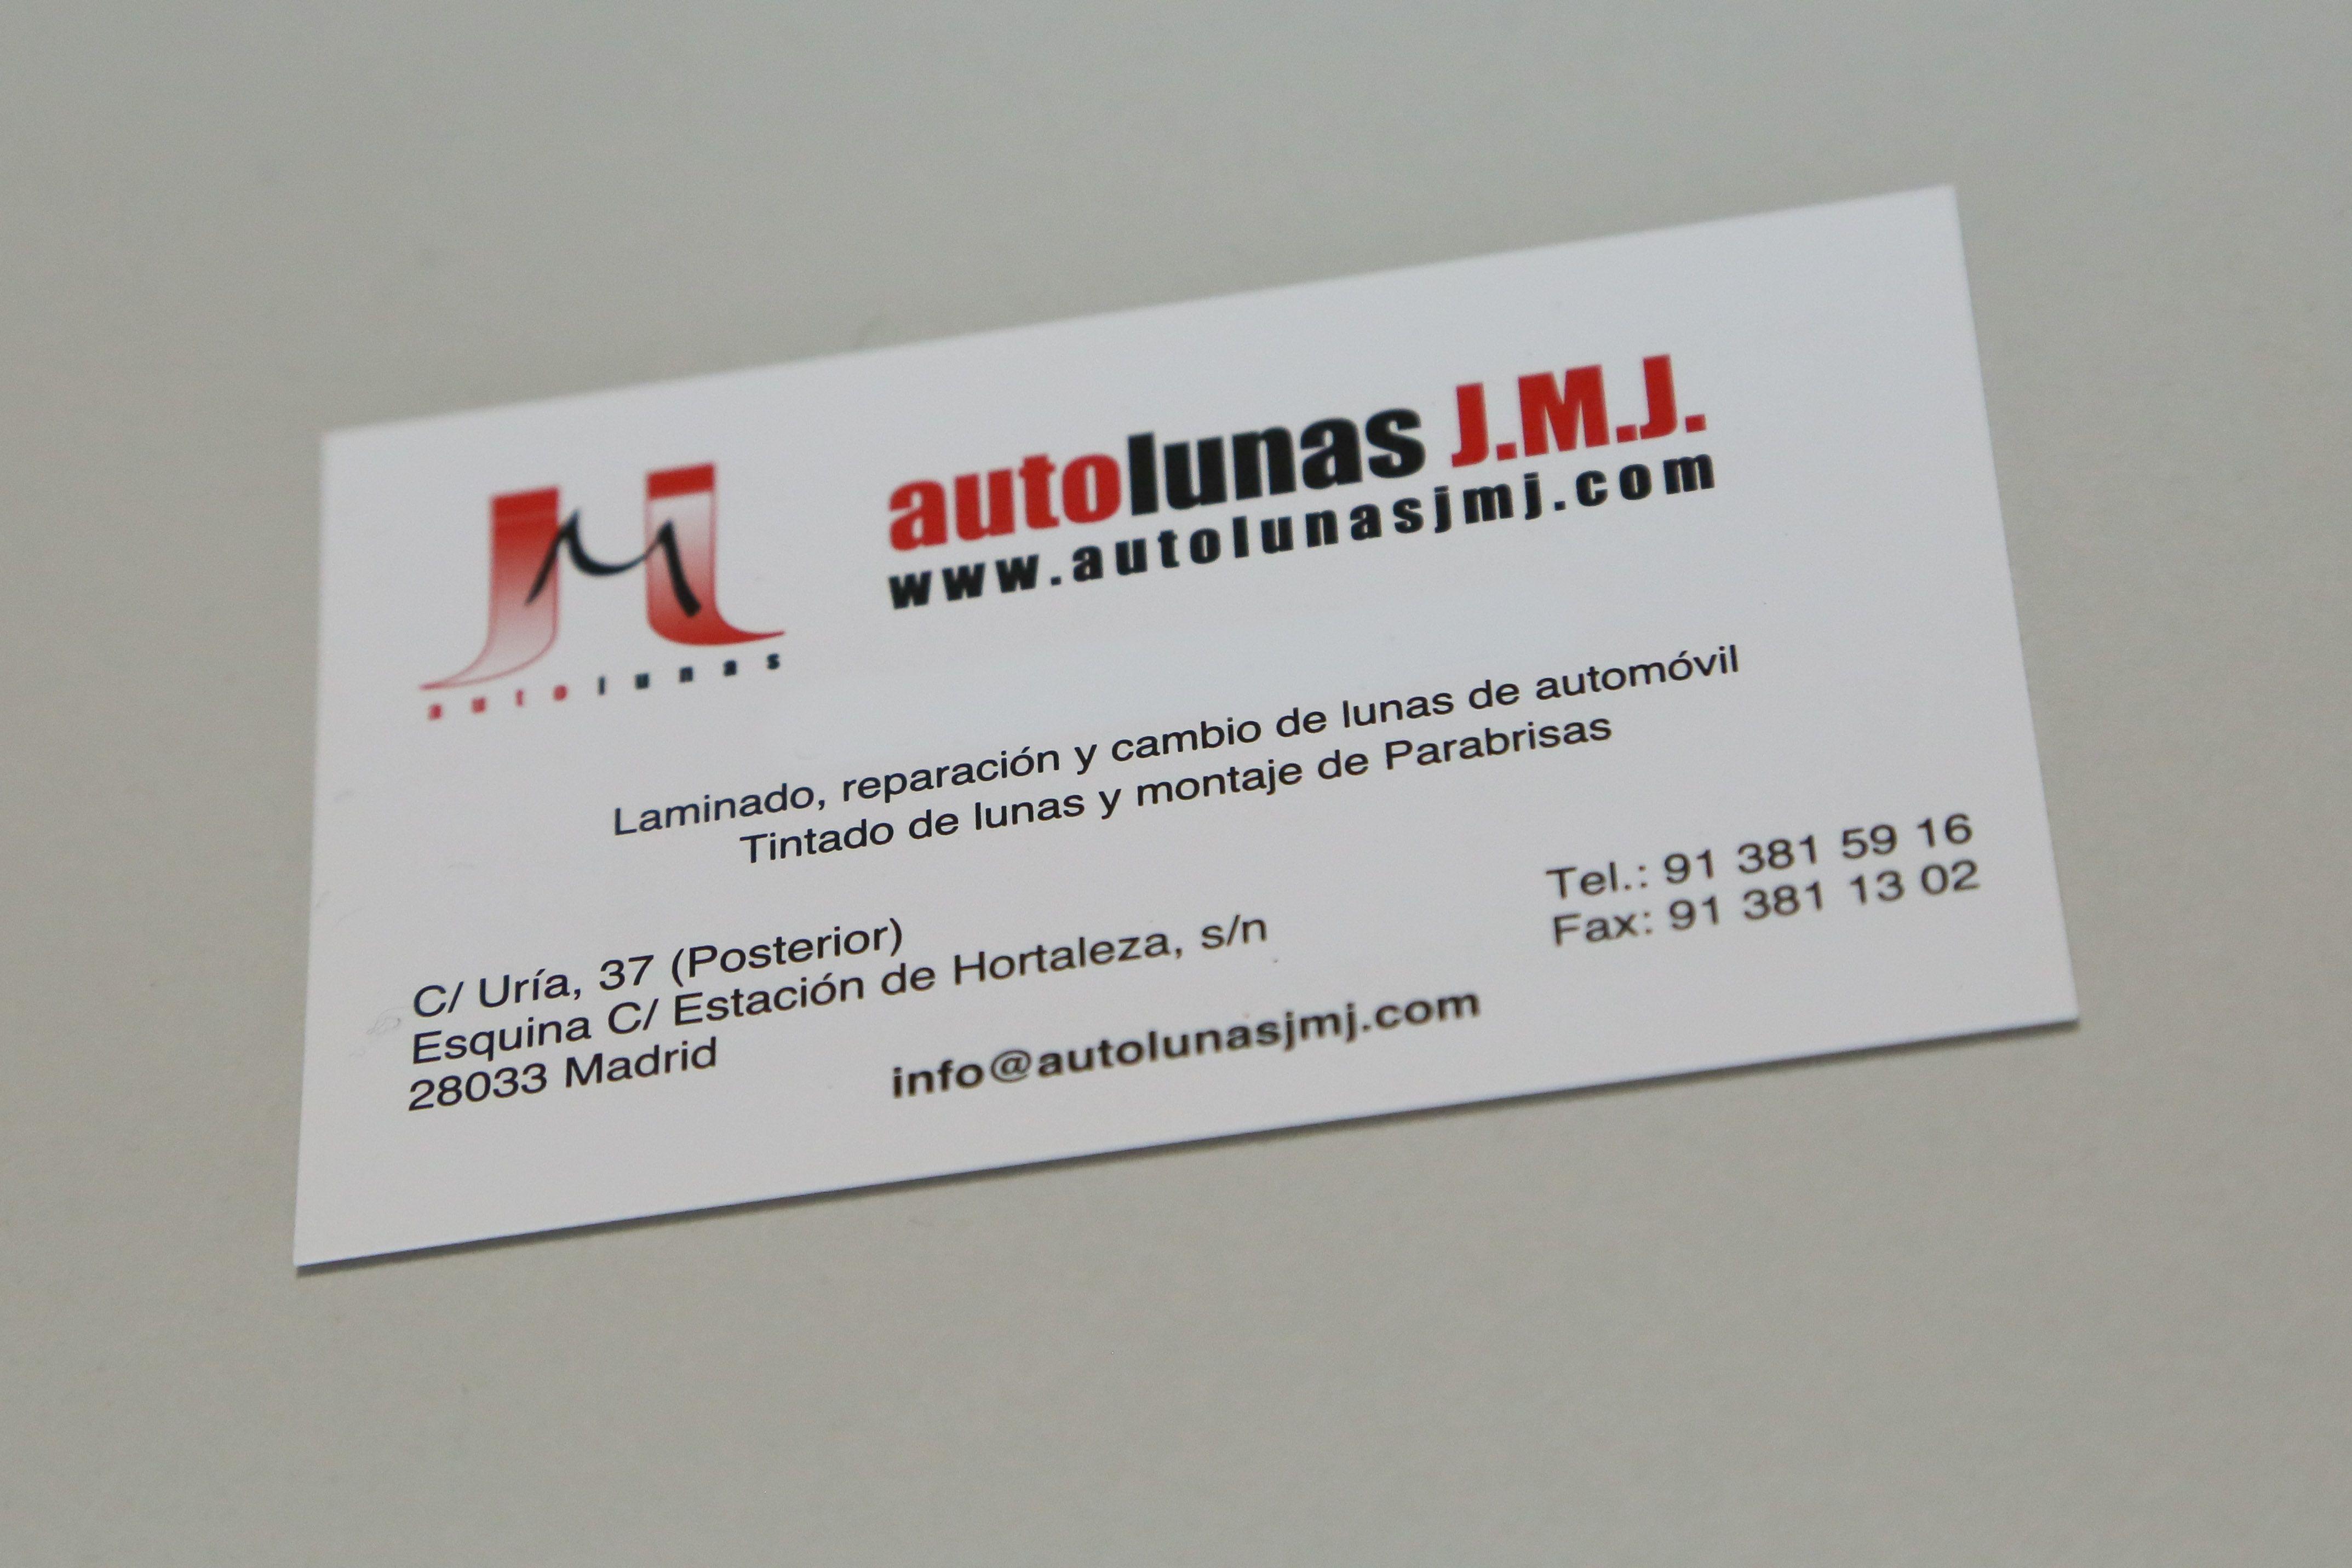 Foto 3 de Lunas de automóviles en Madrid | Autolunas J.M.J.